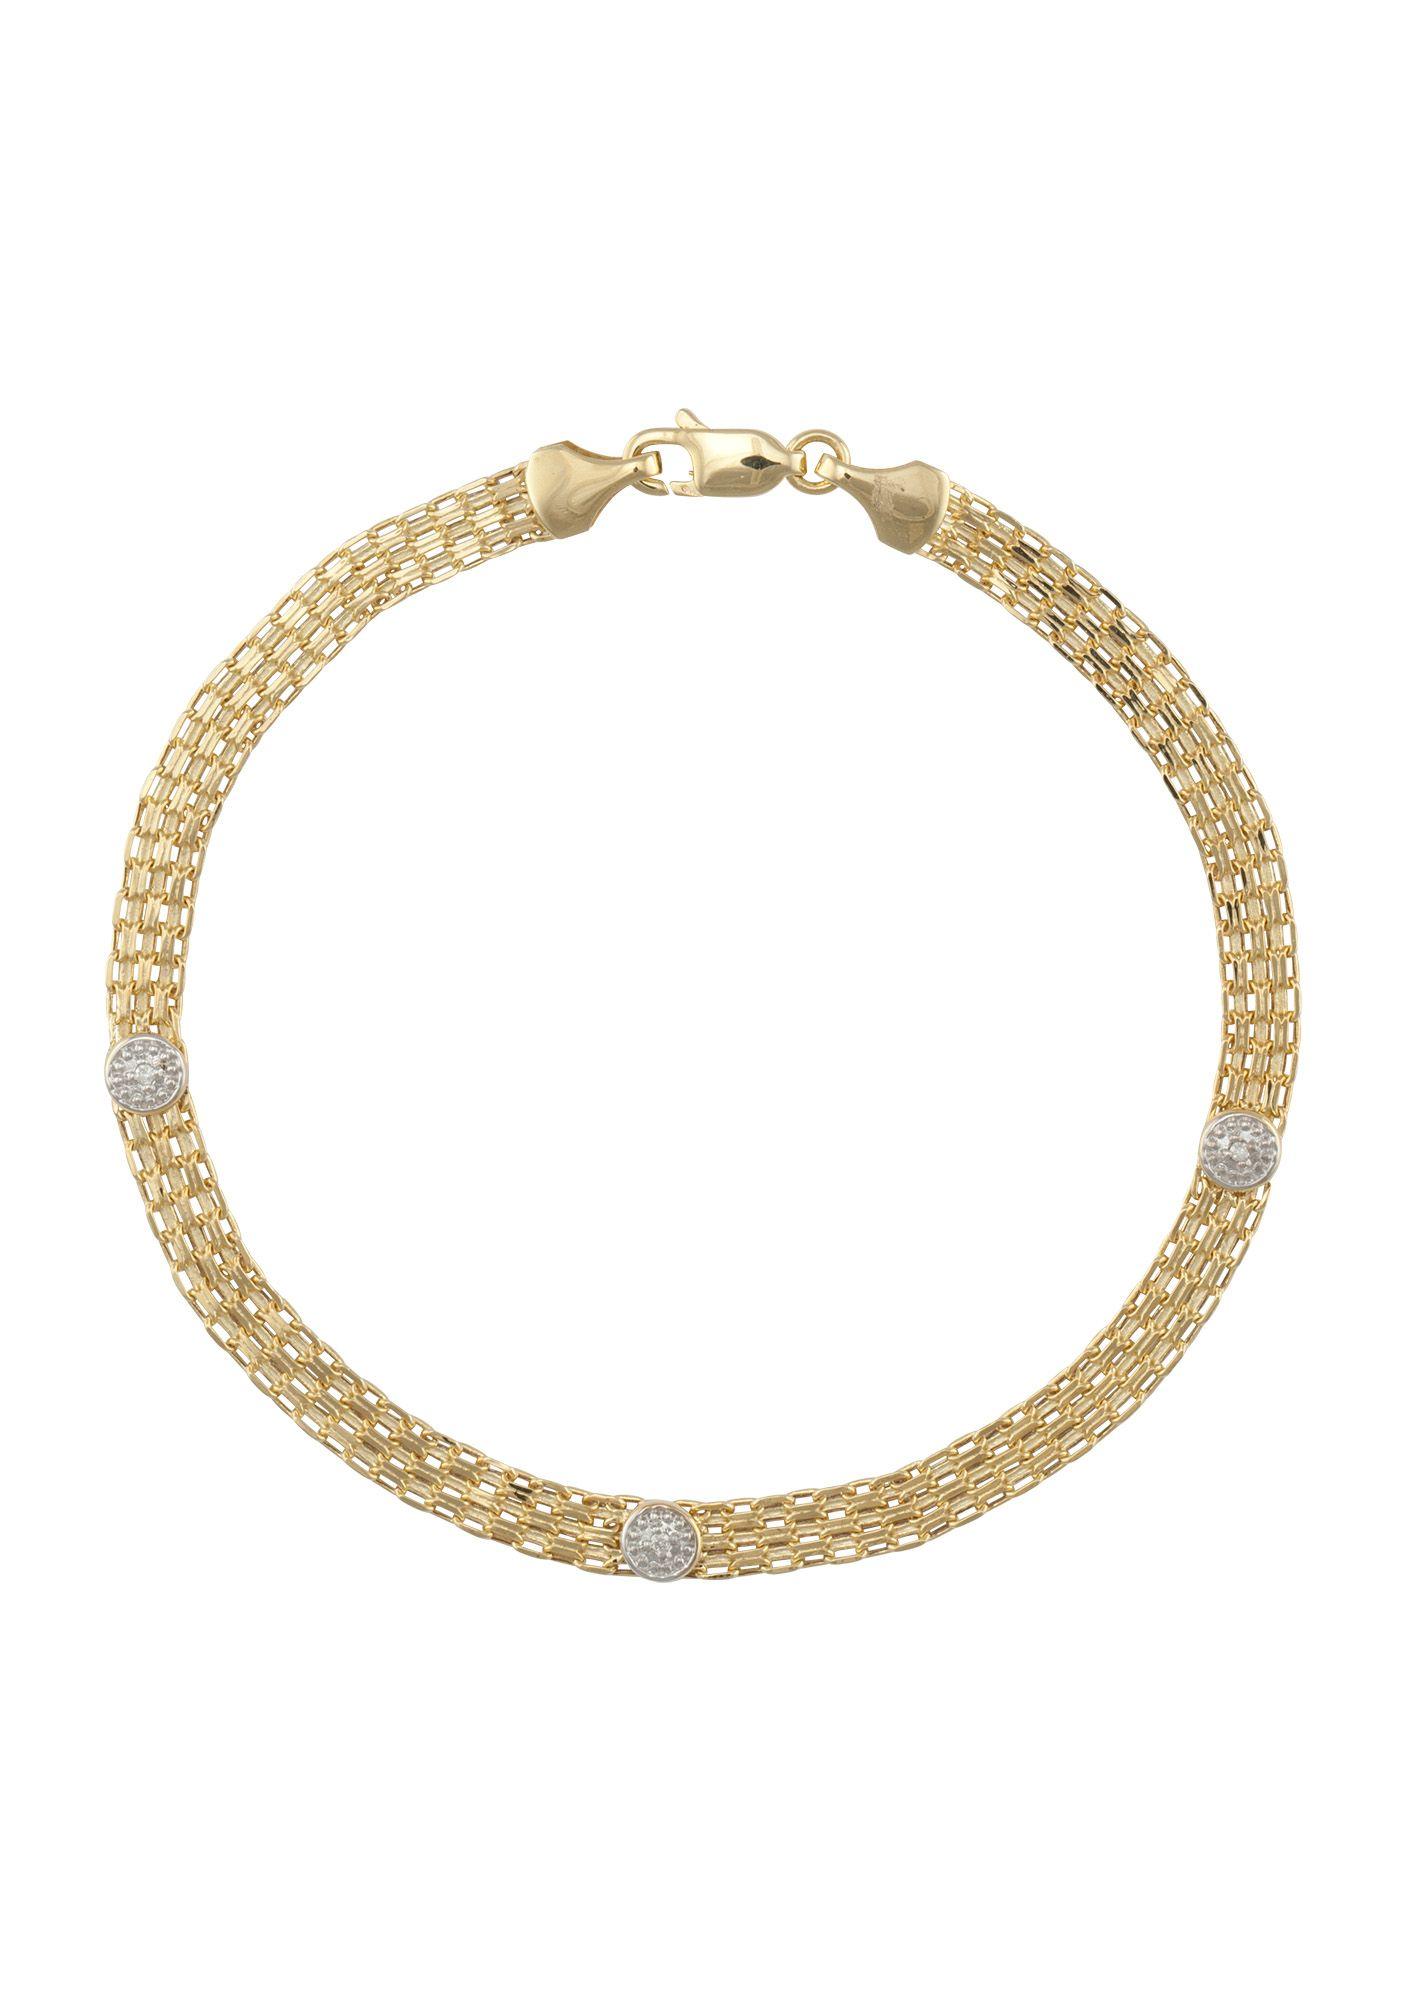 FIRETTI firetti Armschmuck: Armband in Bismarckkettengliederung mit Diamanten